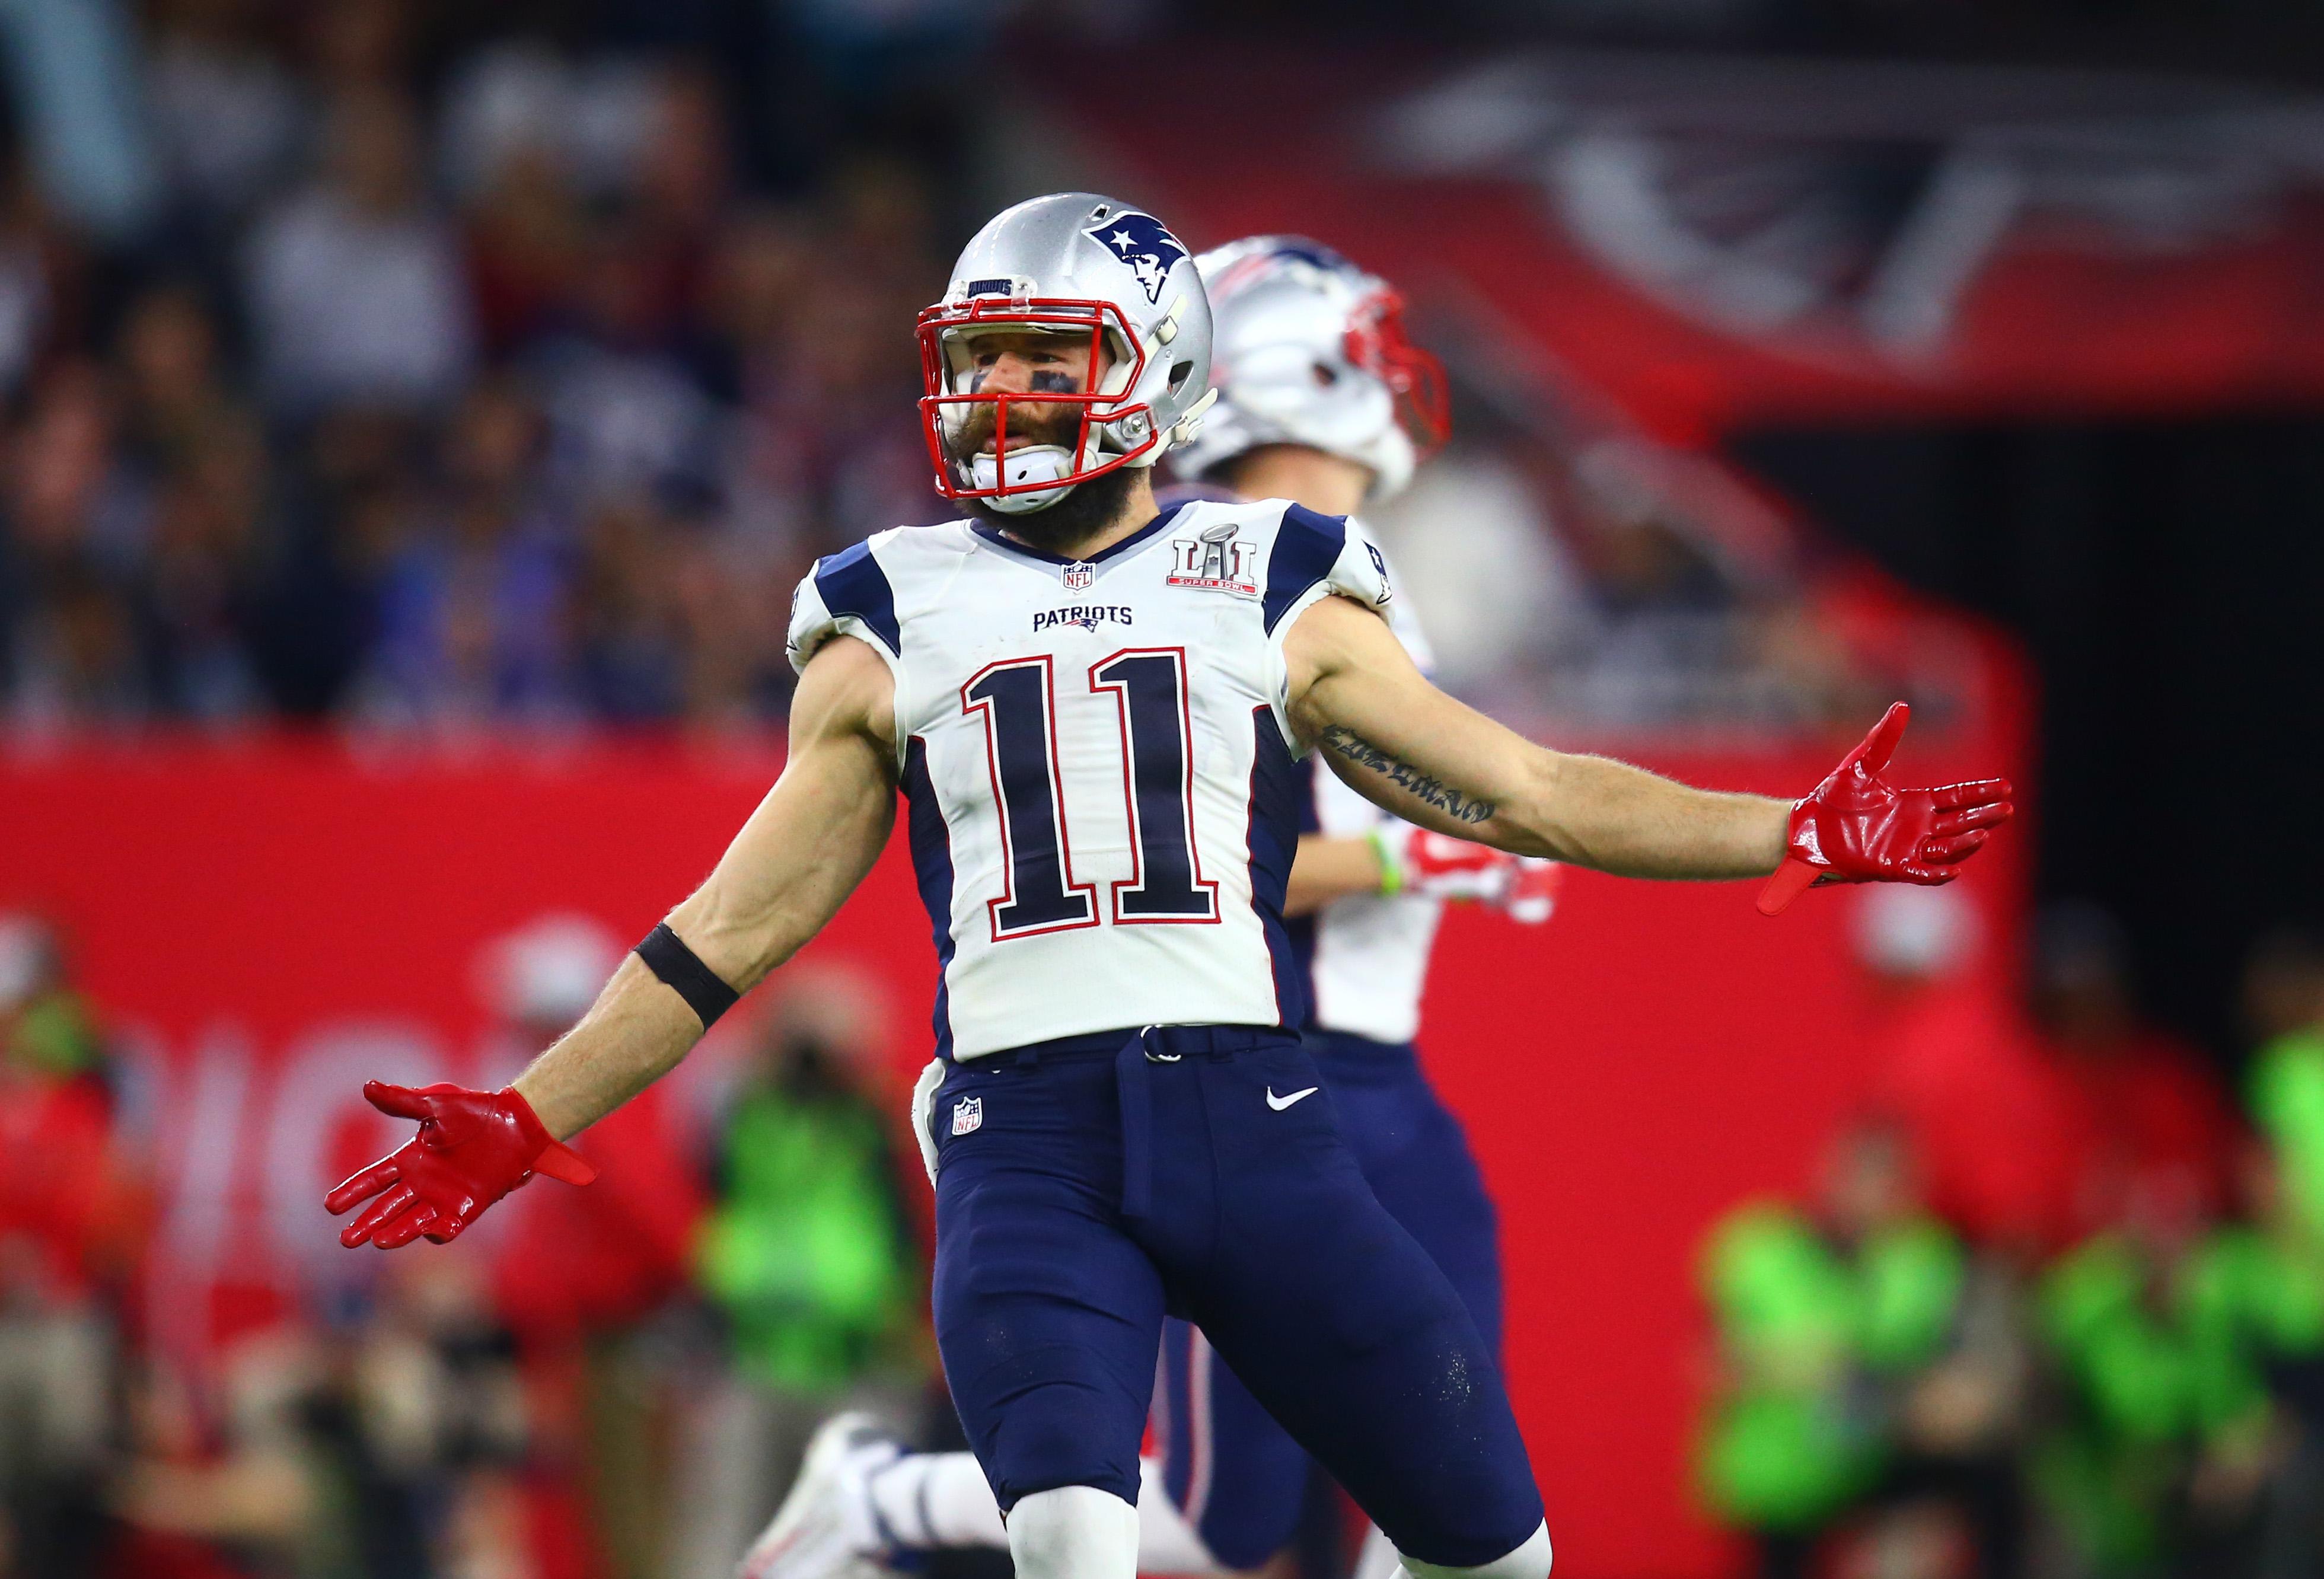 New England Patriots: Julian Edelman No. 71 on 'NFL Top 100' list